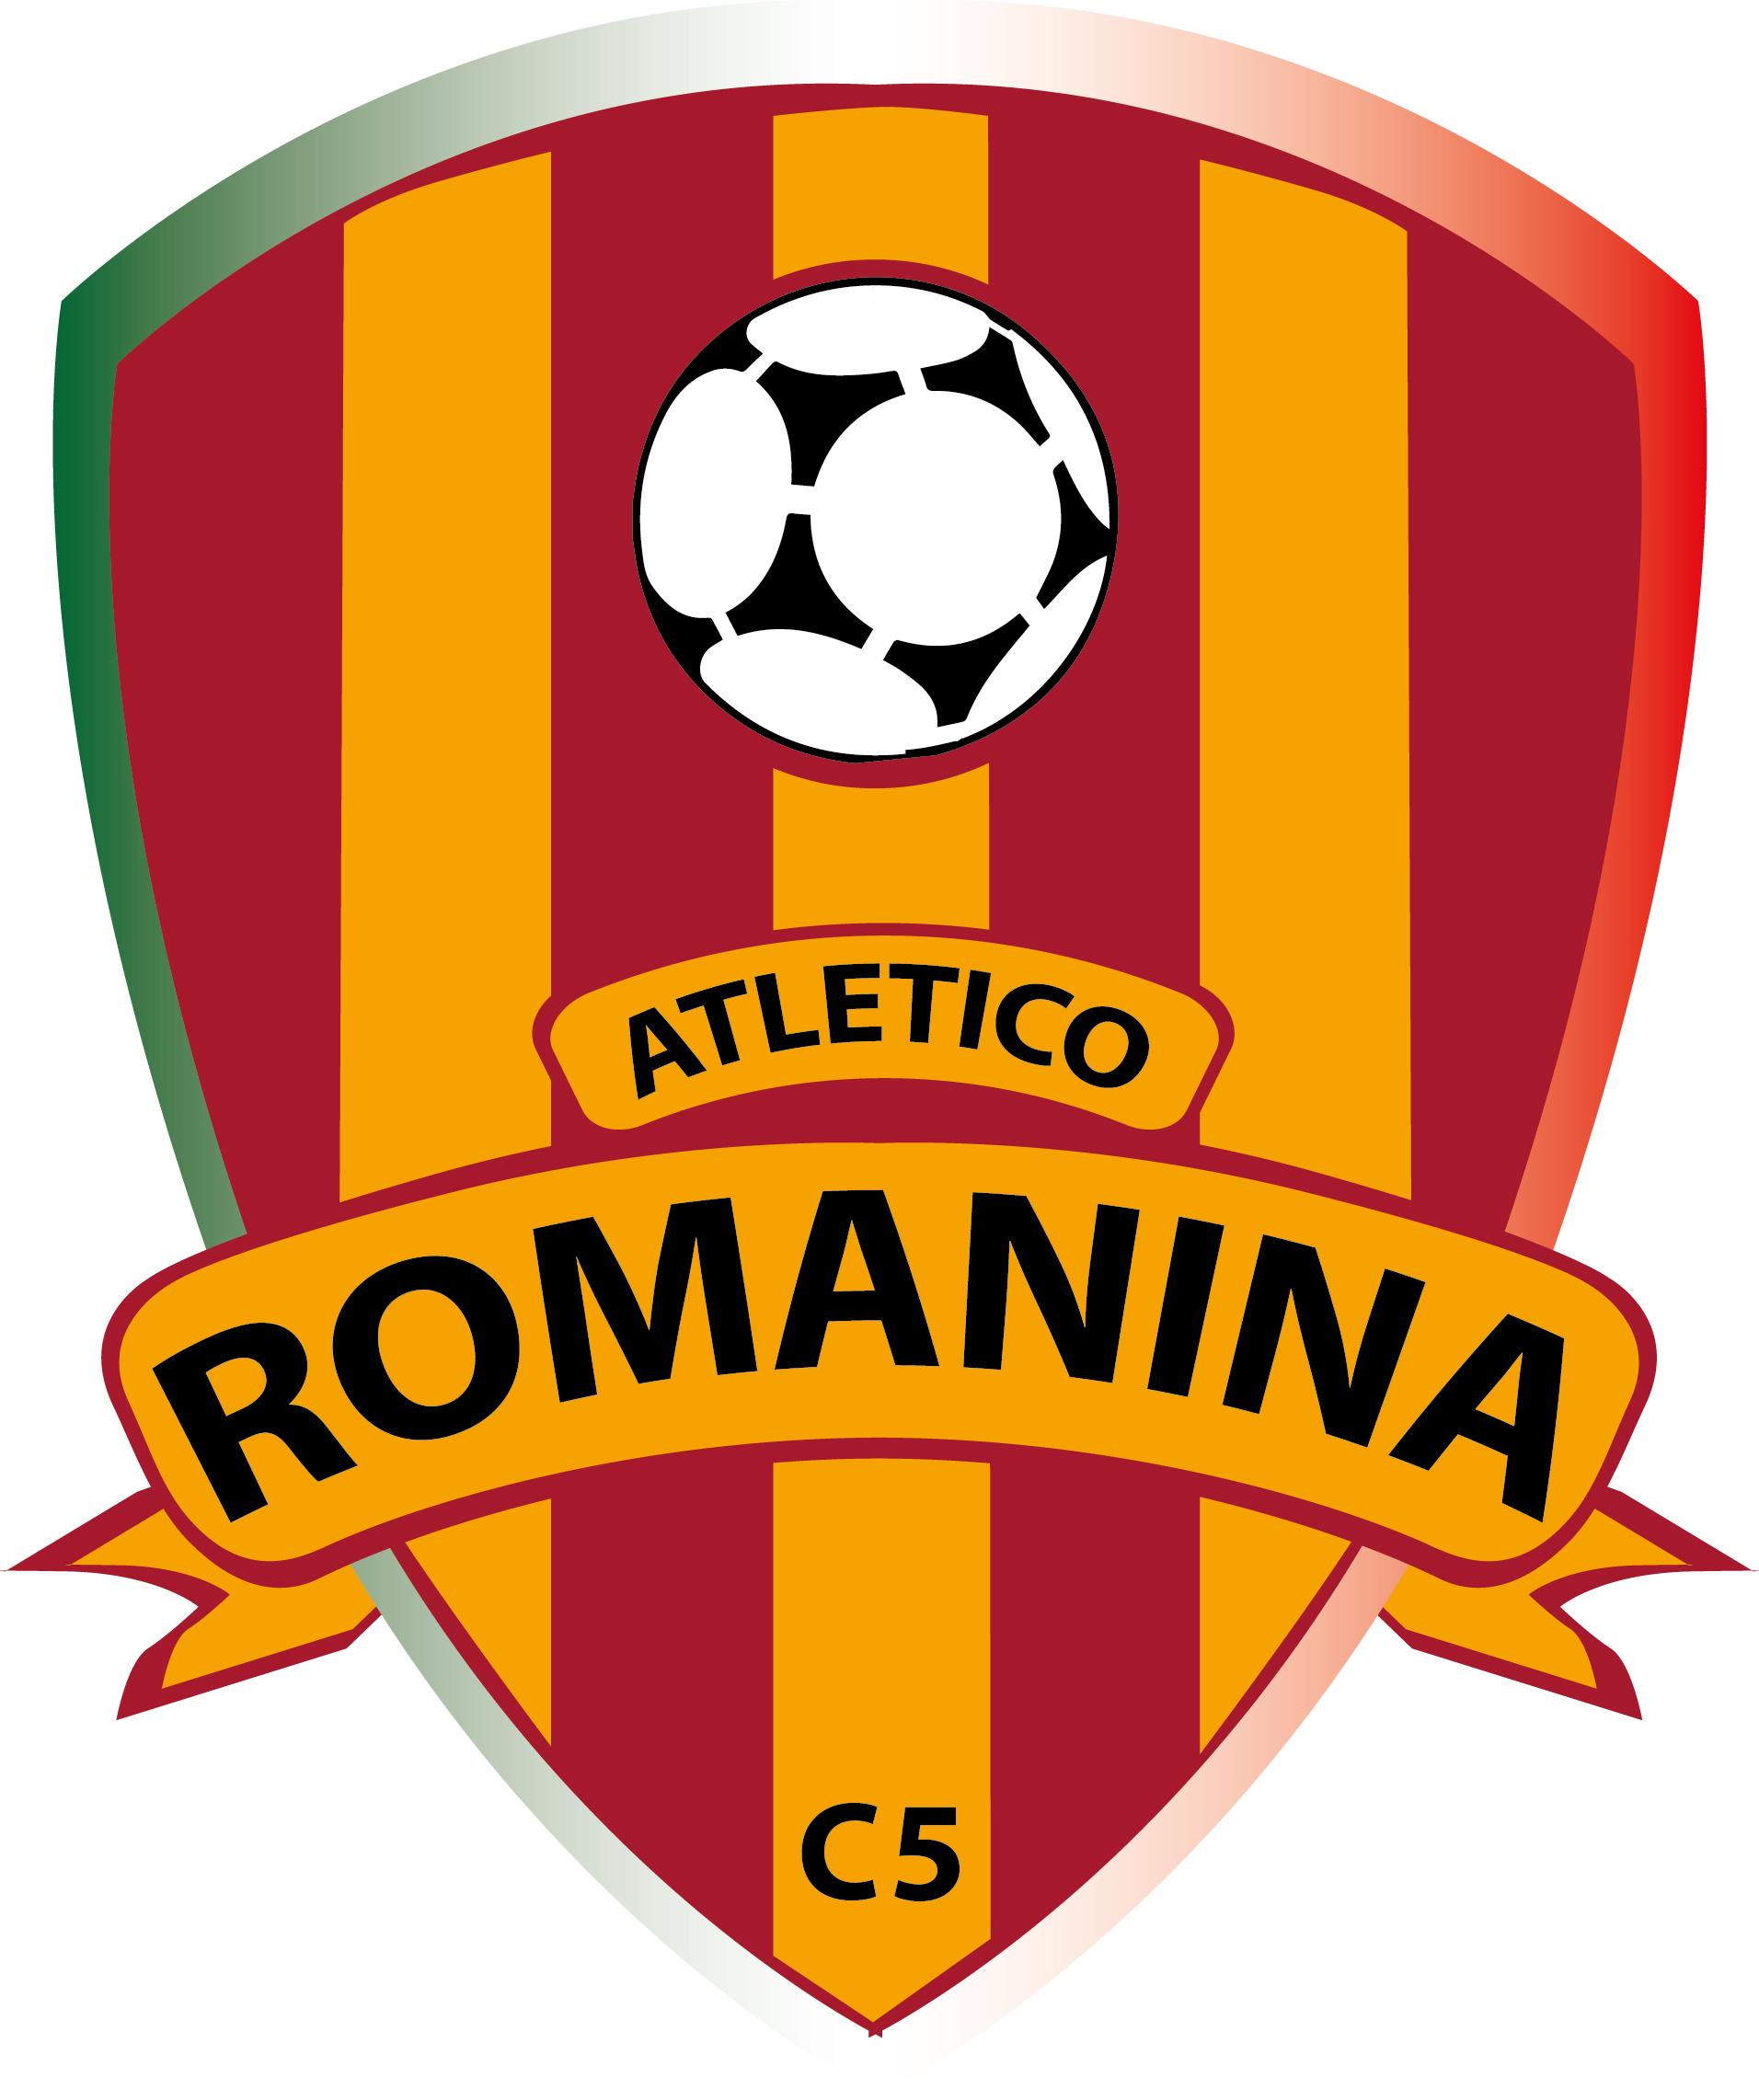 ATLETICO ROMANINA